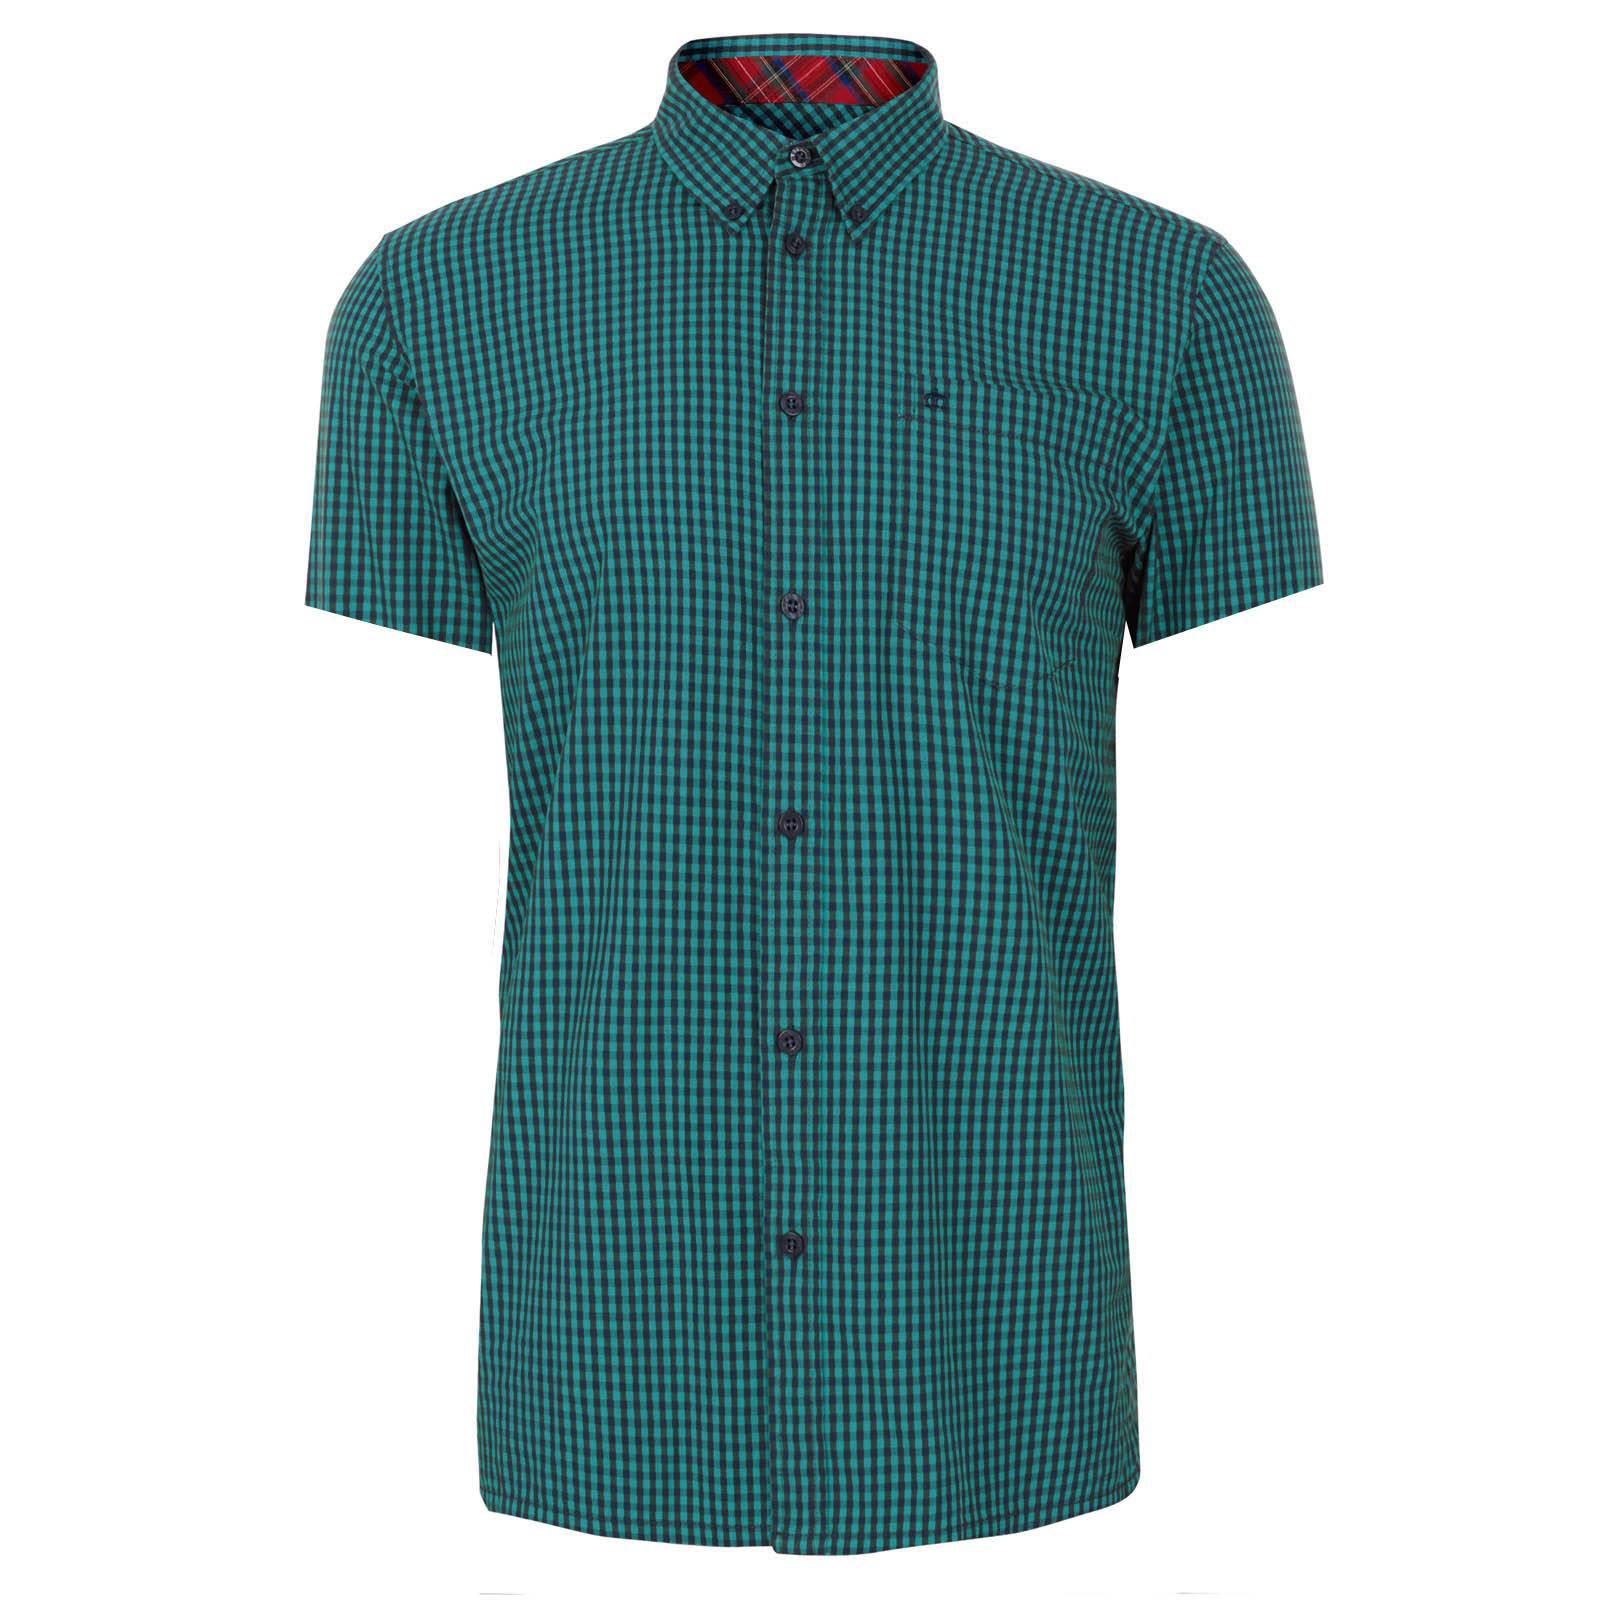 Рубашка TerryCORE<br><br><br>Артикул: 1570108<br>Материал: 100% хлопок<br>Цвет: сине-зеленая клетка<br>Пол: Мужской